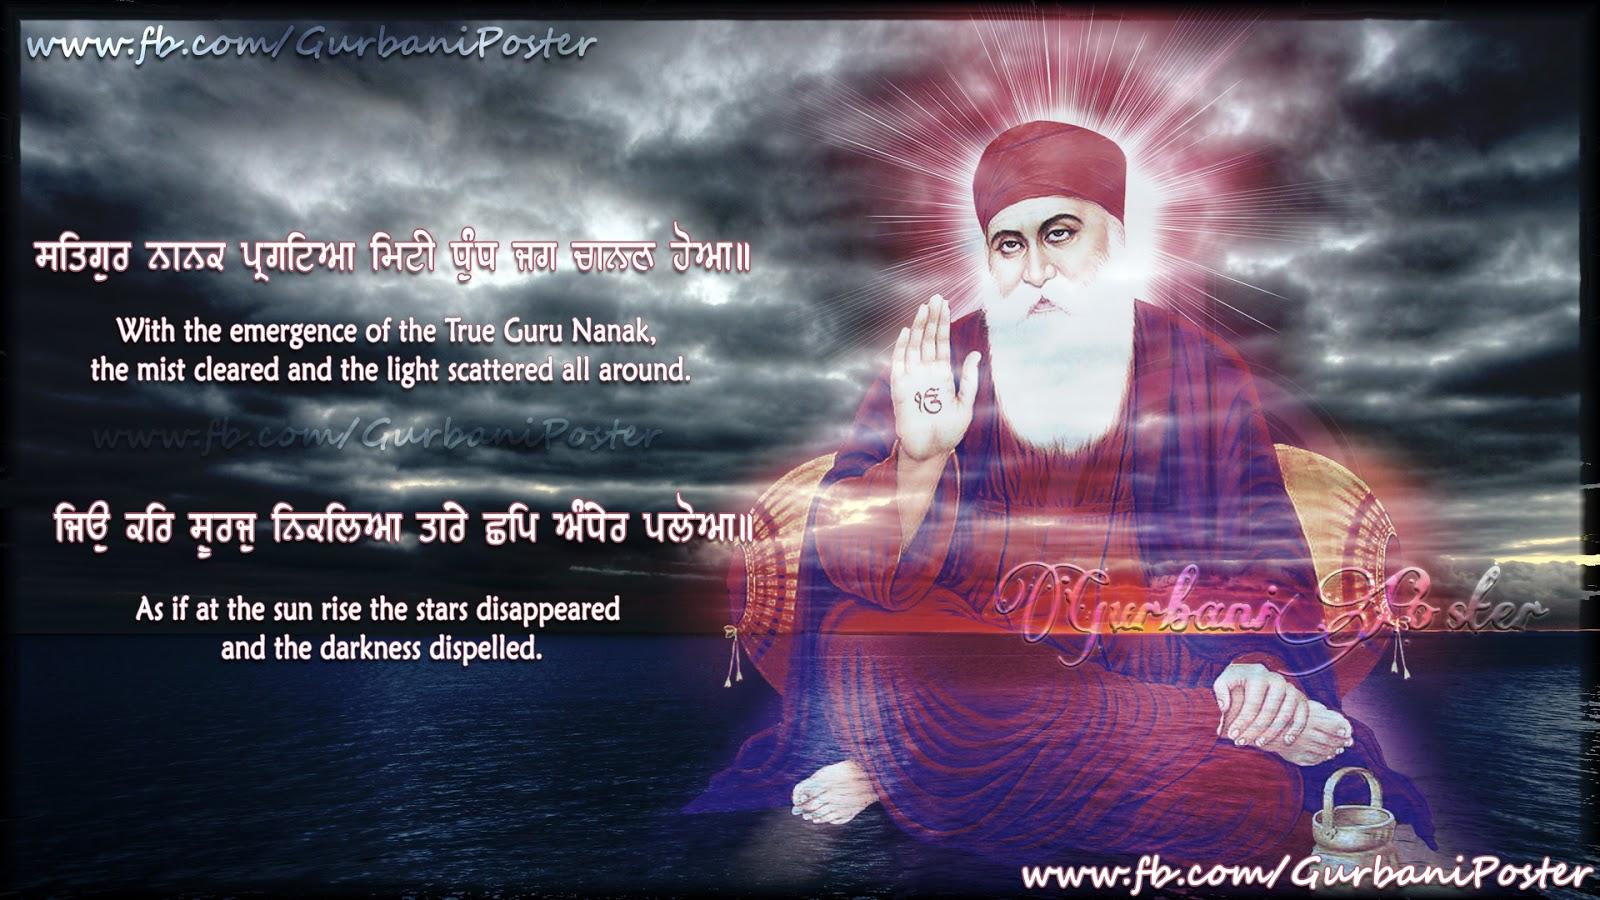 http://4.bp.blogspot.com/-OHnUiaxA8Hg/ULMBs1FPZnI/AAAAAAAAAMM/AIvRp0w4a1g/s1600/gurbani-poster-guru-nanak-dev-ji=-gurpurab-hd-wallpaper-wadhayi.jpg